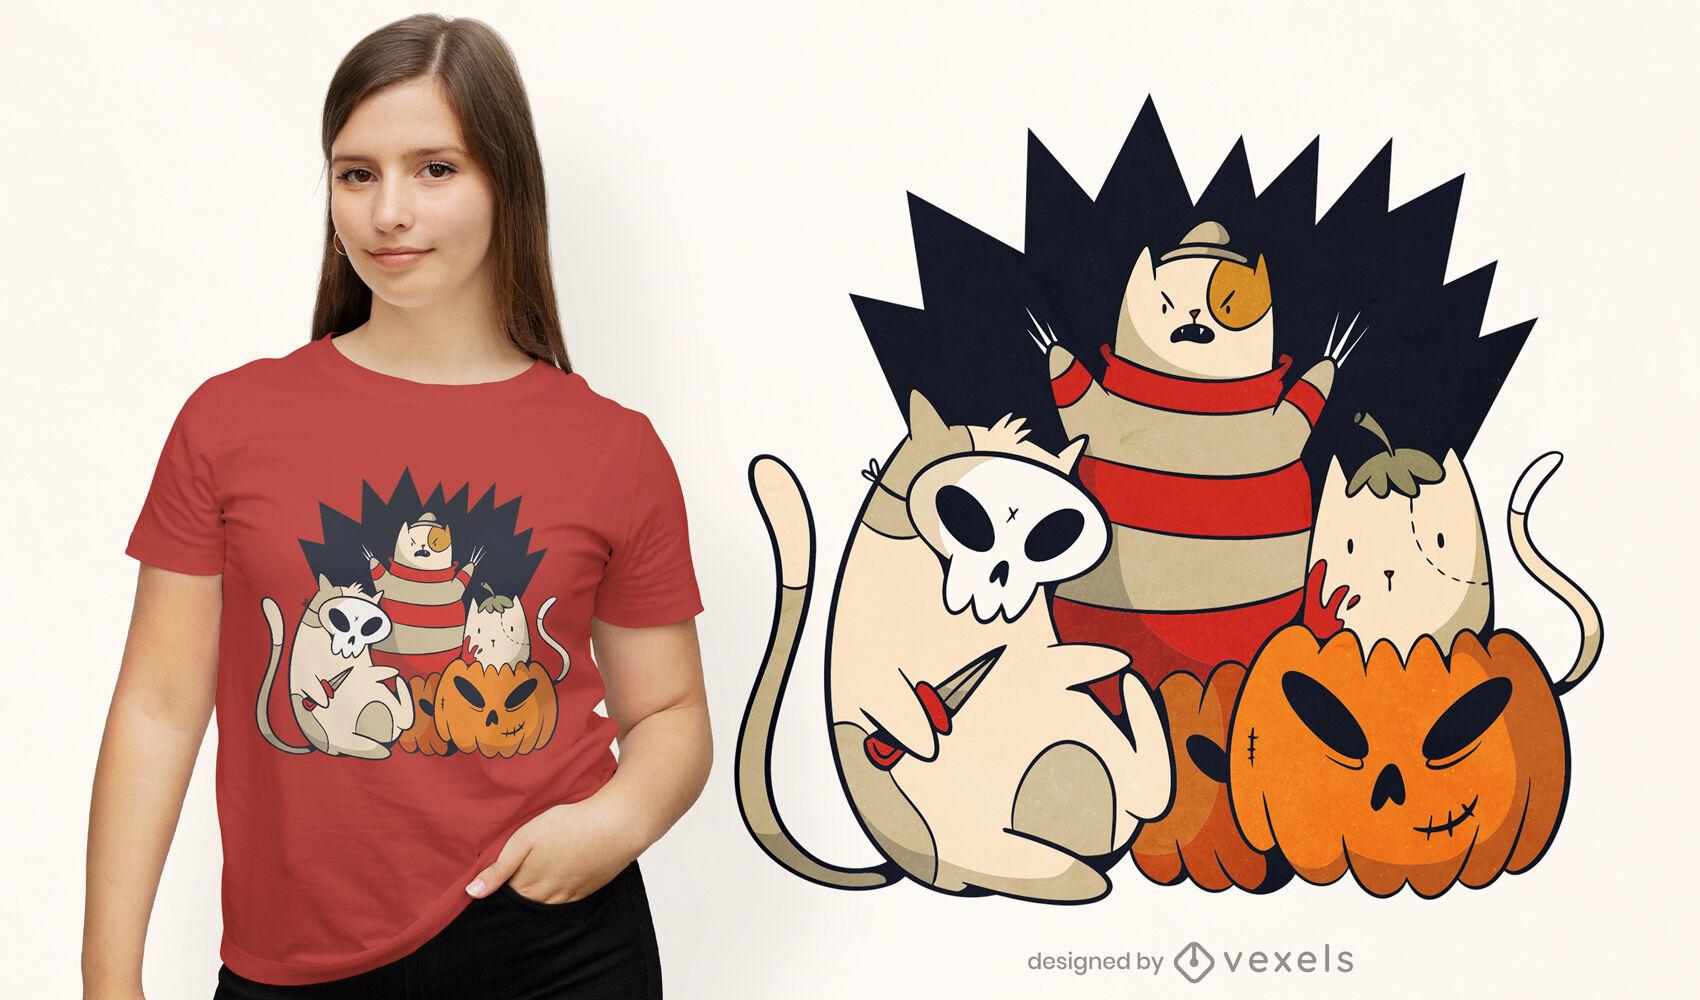 Diseño de camiseta de spoky halloween cats 'squad